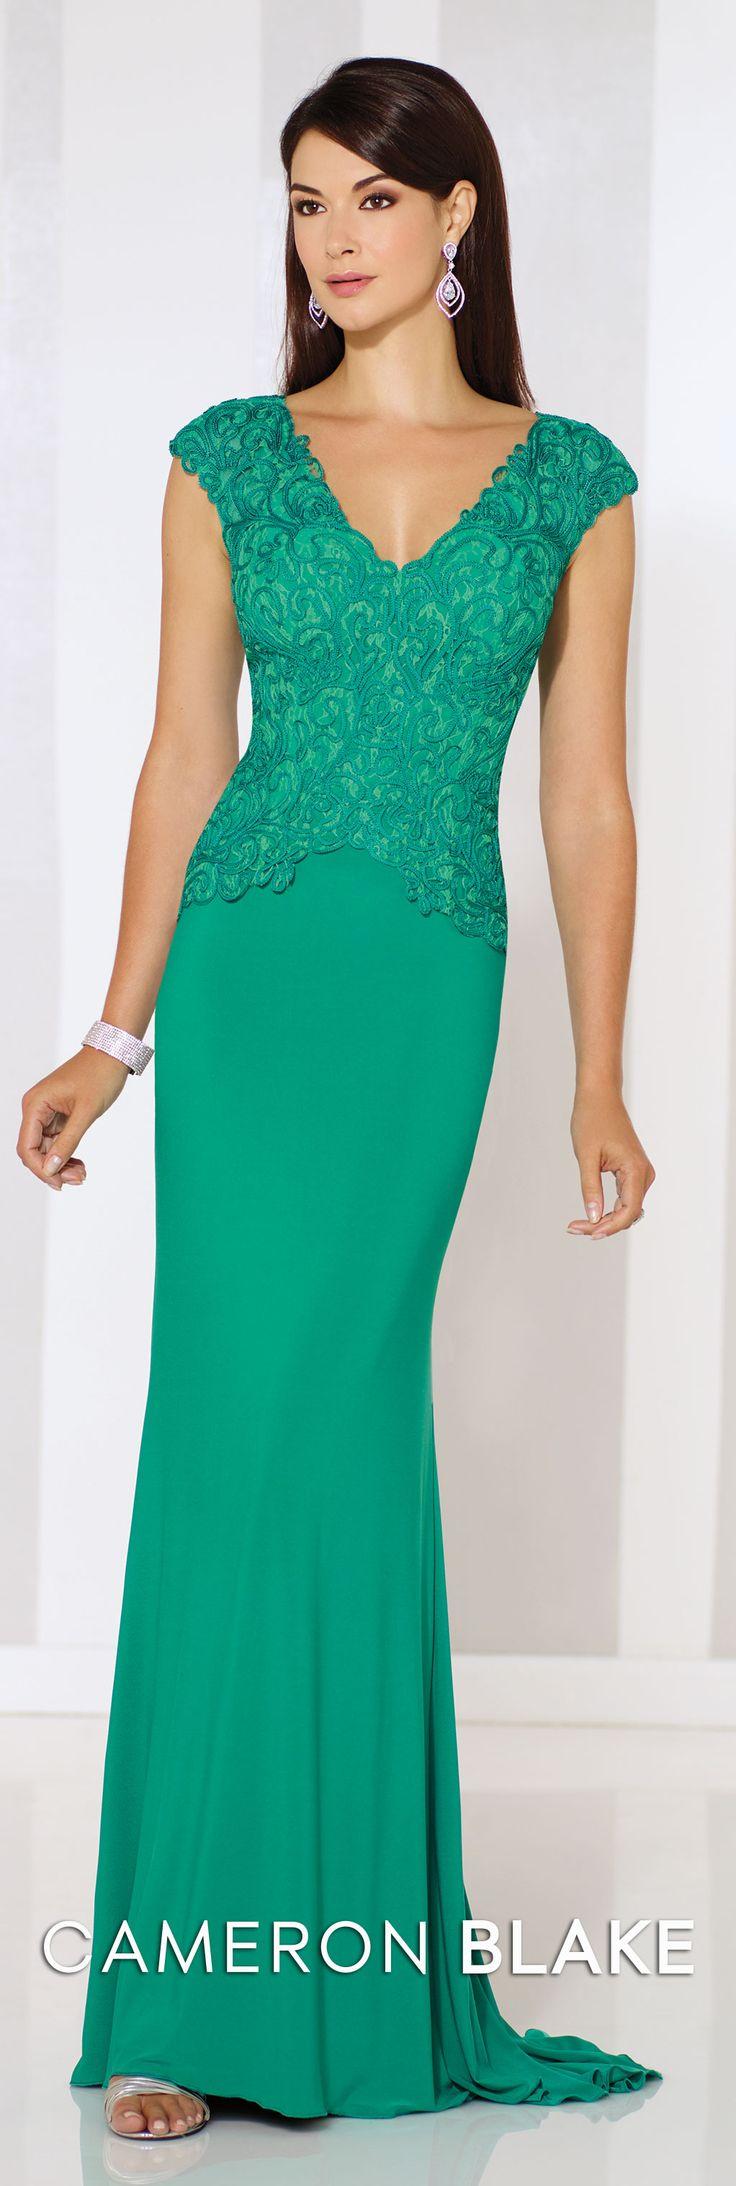 Cameron Blake Spring 2016 - Style No. 116667 #formaleveningdresses  Amanda Earrings www.davidtuteraembellish.com